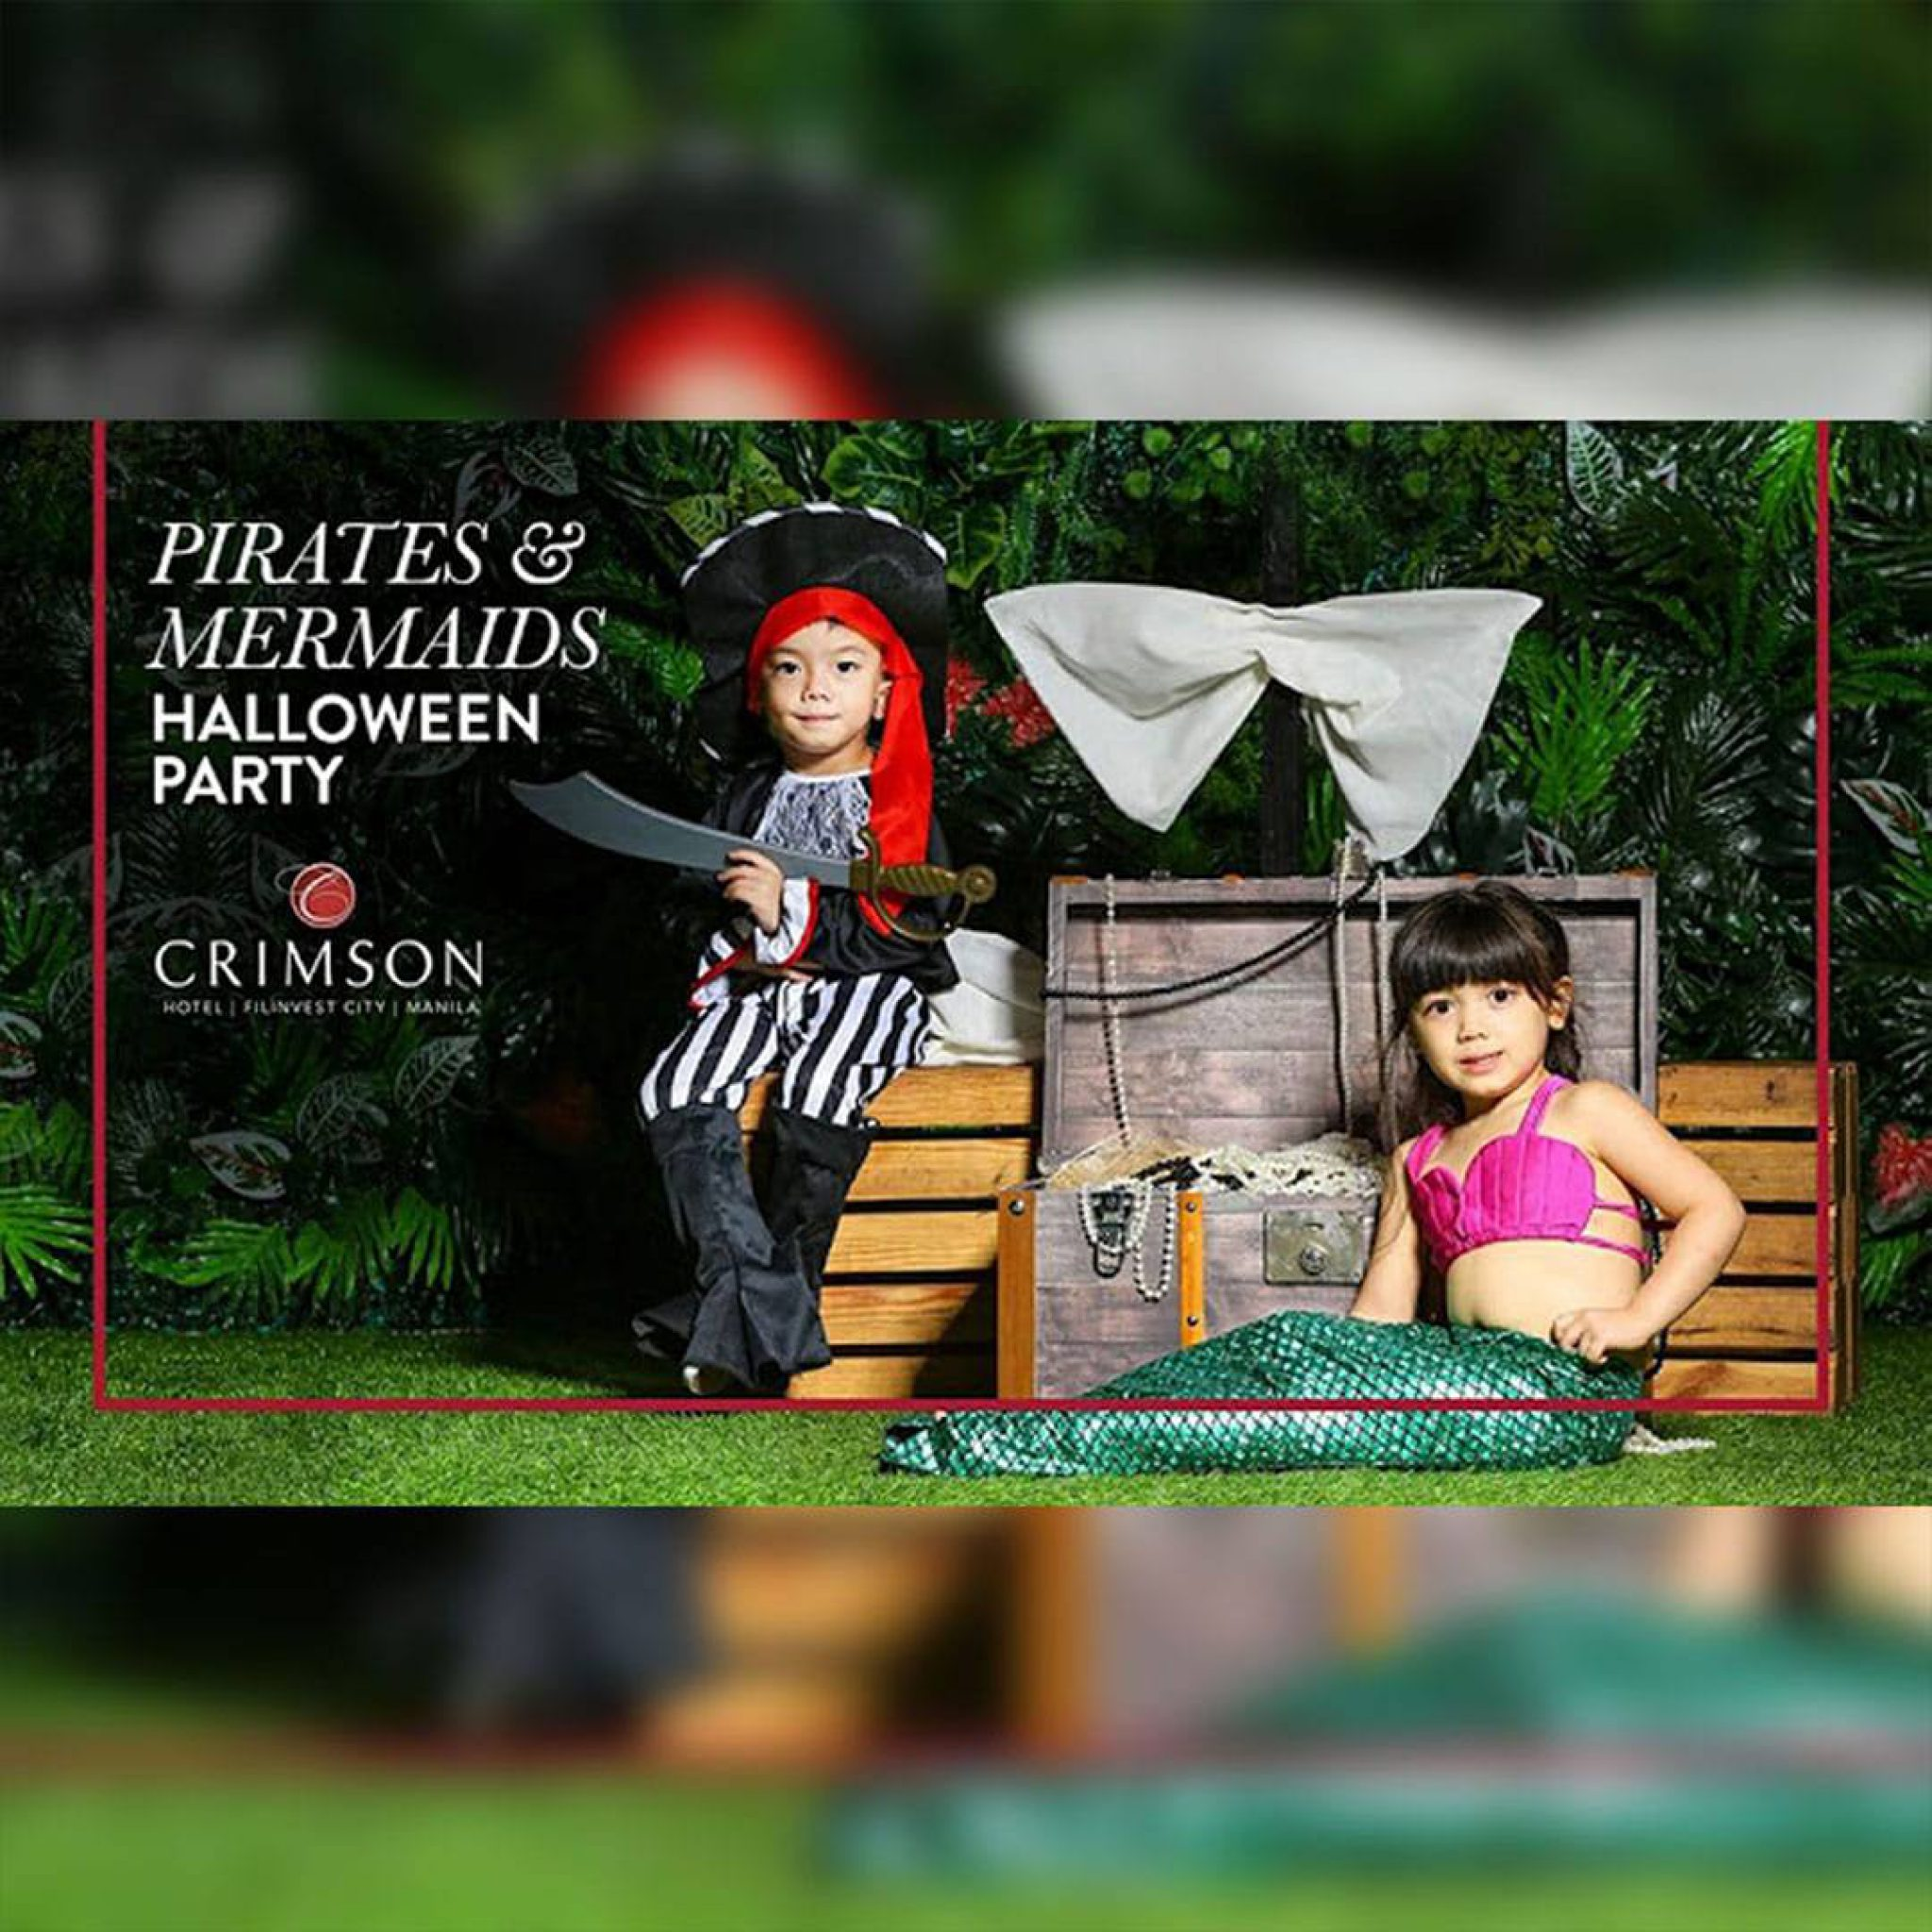 Crimson Hotel: Pirates and Mermaid Halloween Party